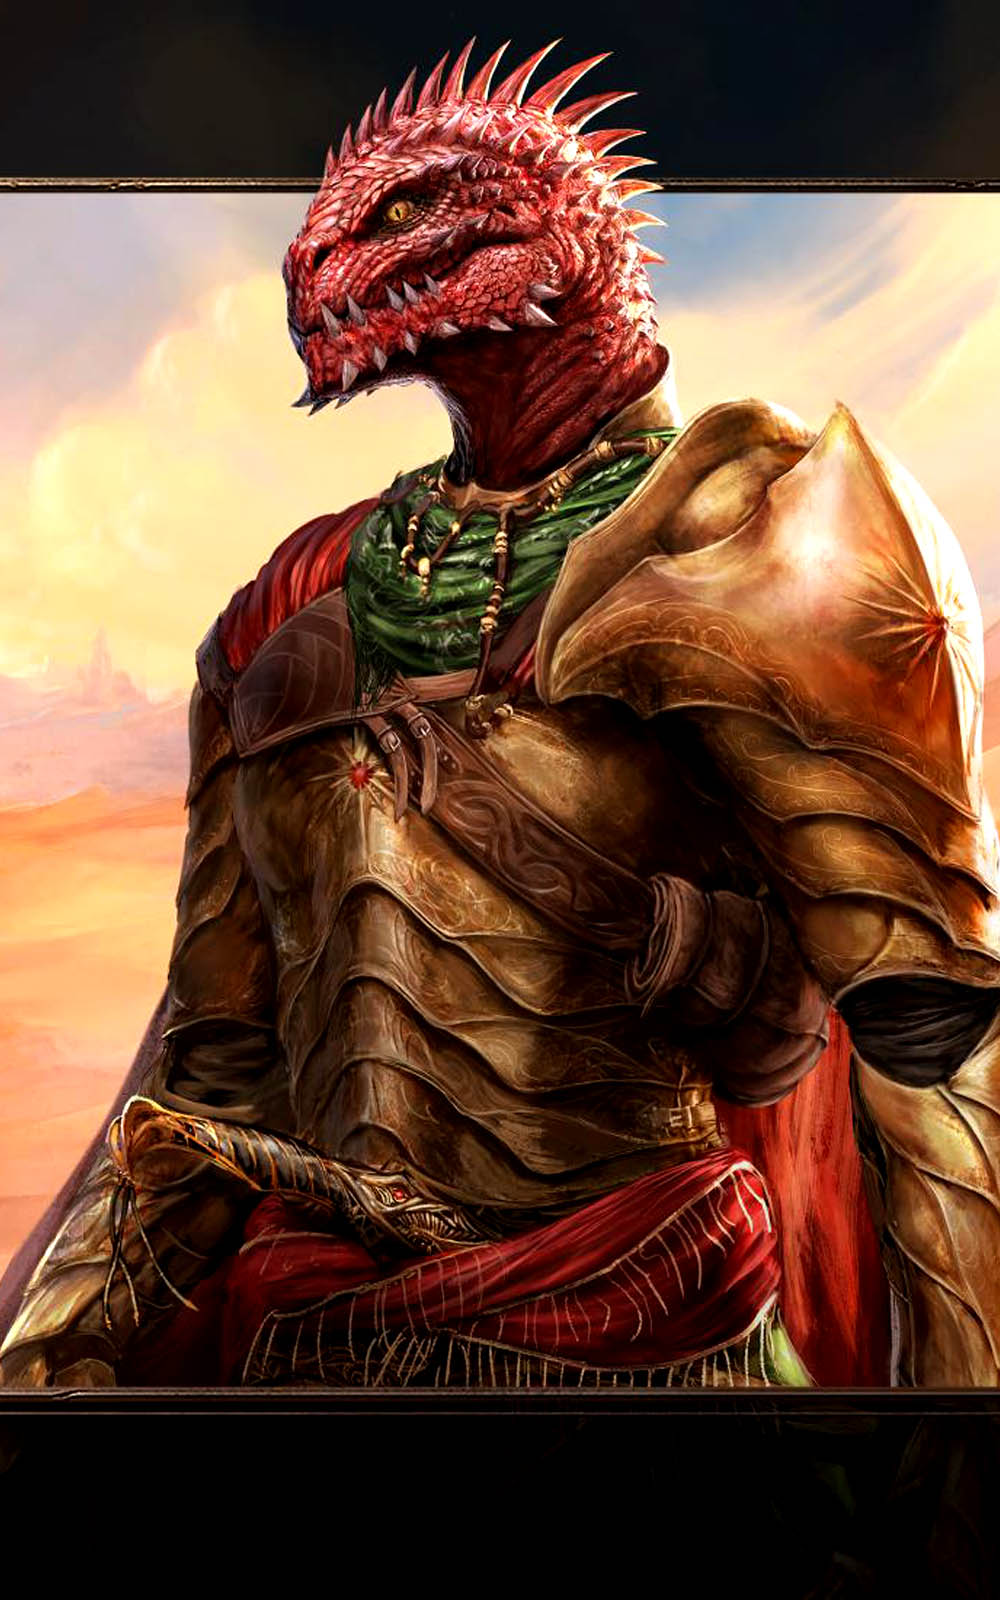 Download Red Prince Divinity - Original Sin II Hero Free